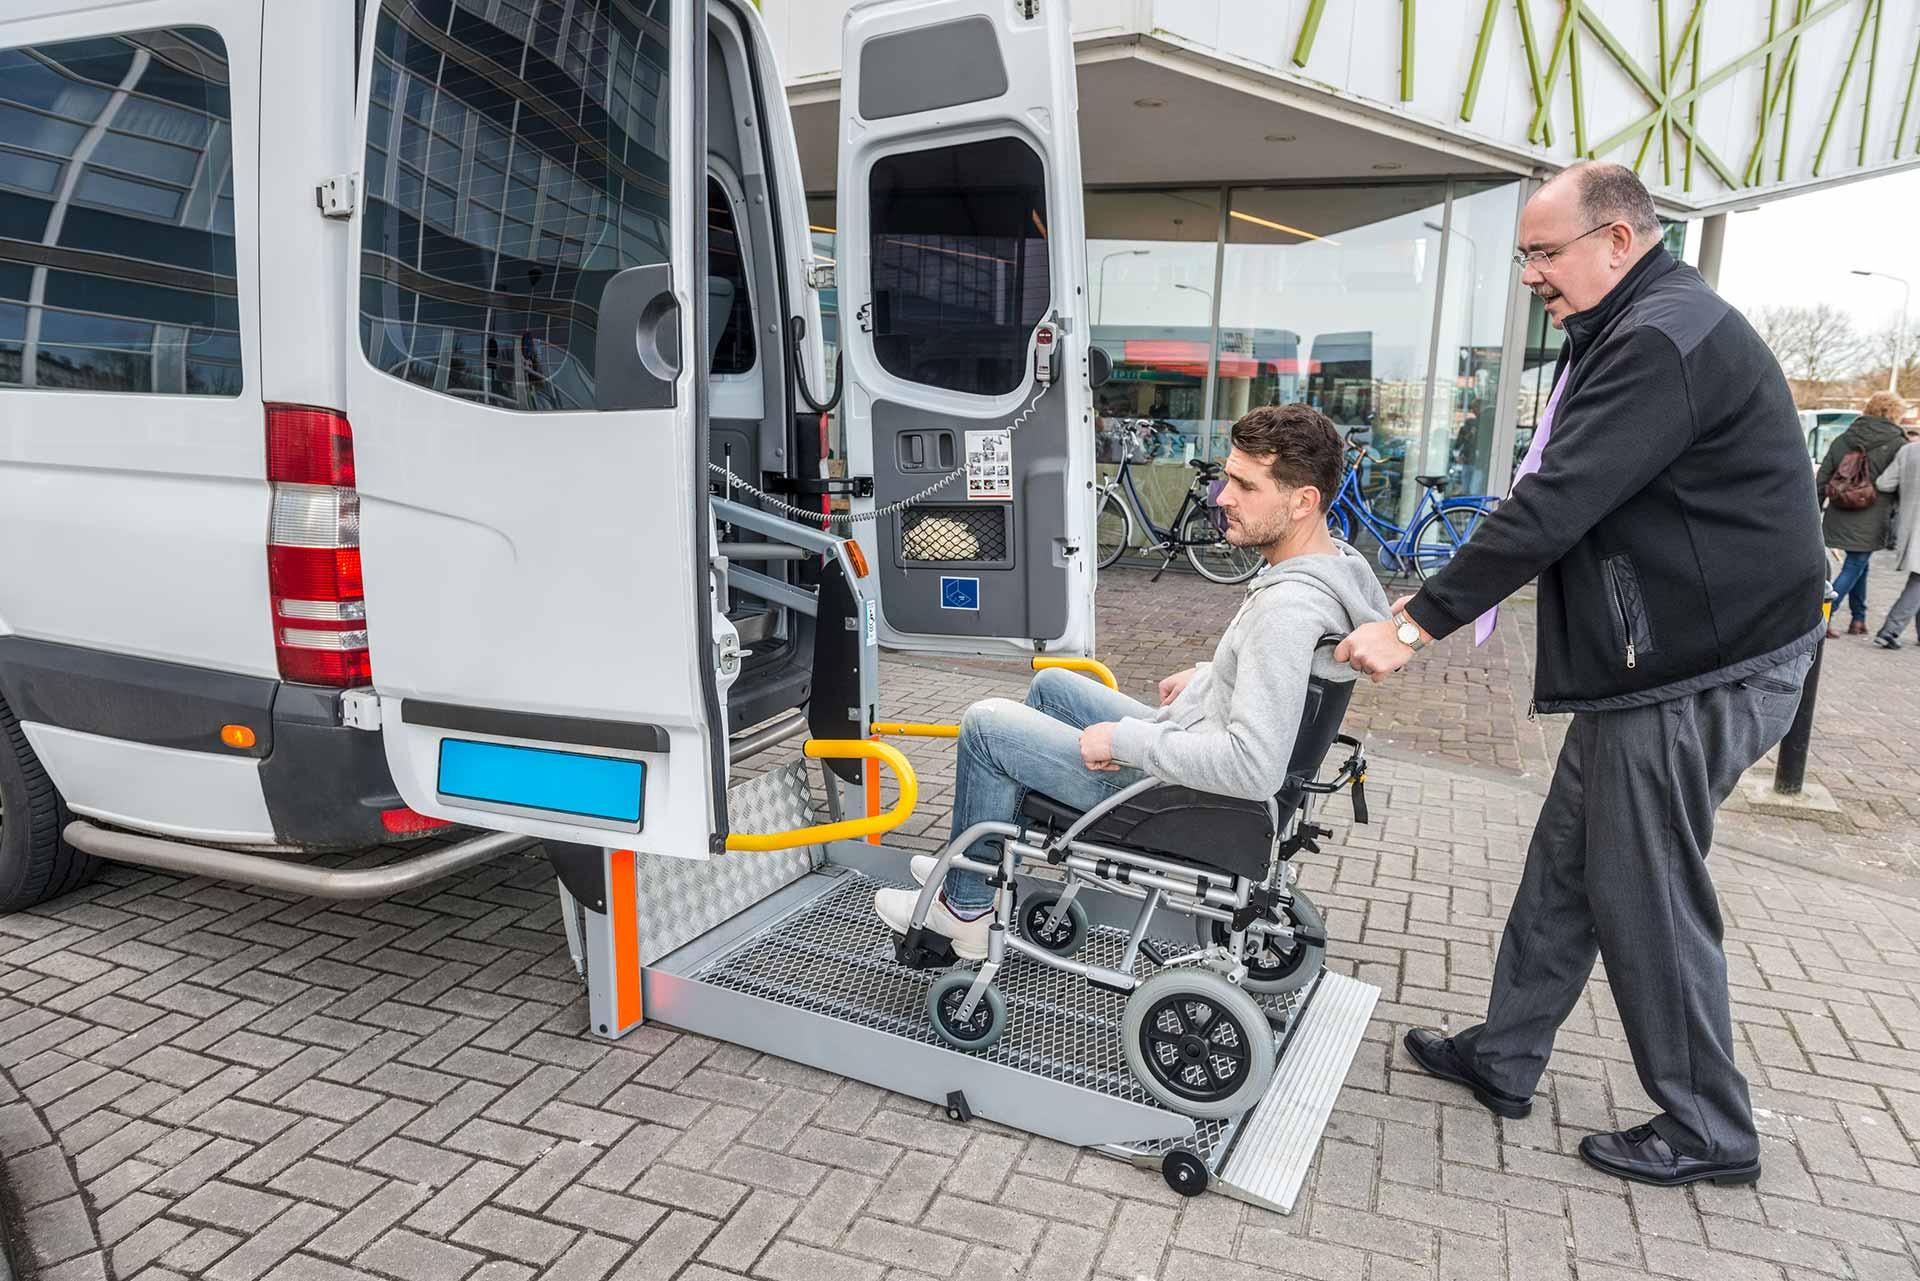 Wheelchair Lift in Blacksburg, Danville, Lexington, Lynchburg, Roanoke, and Rocky Mount, VA